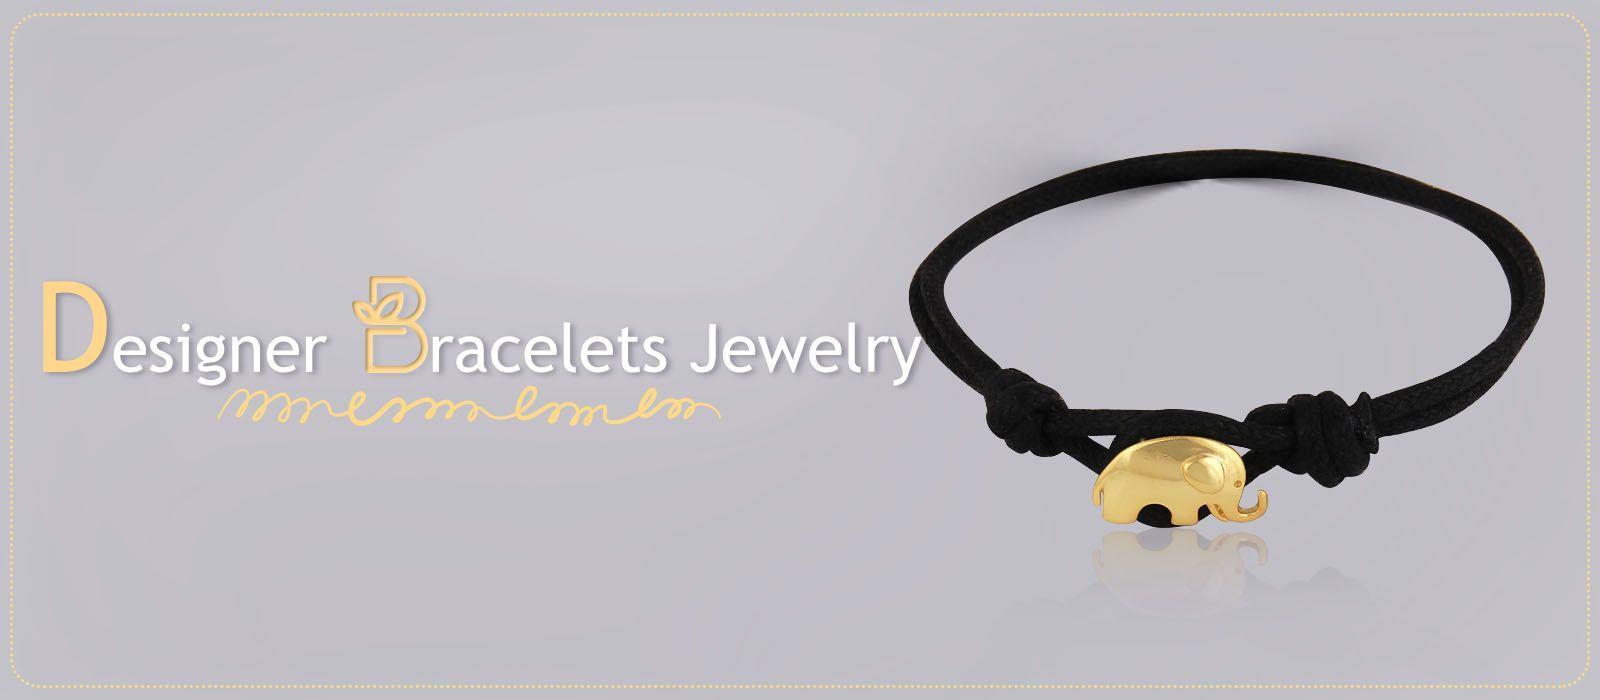 Designers Bracelets Jewelry